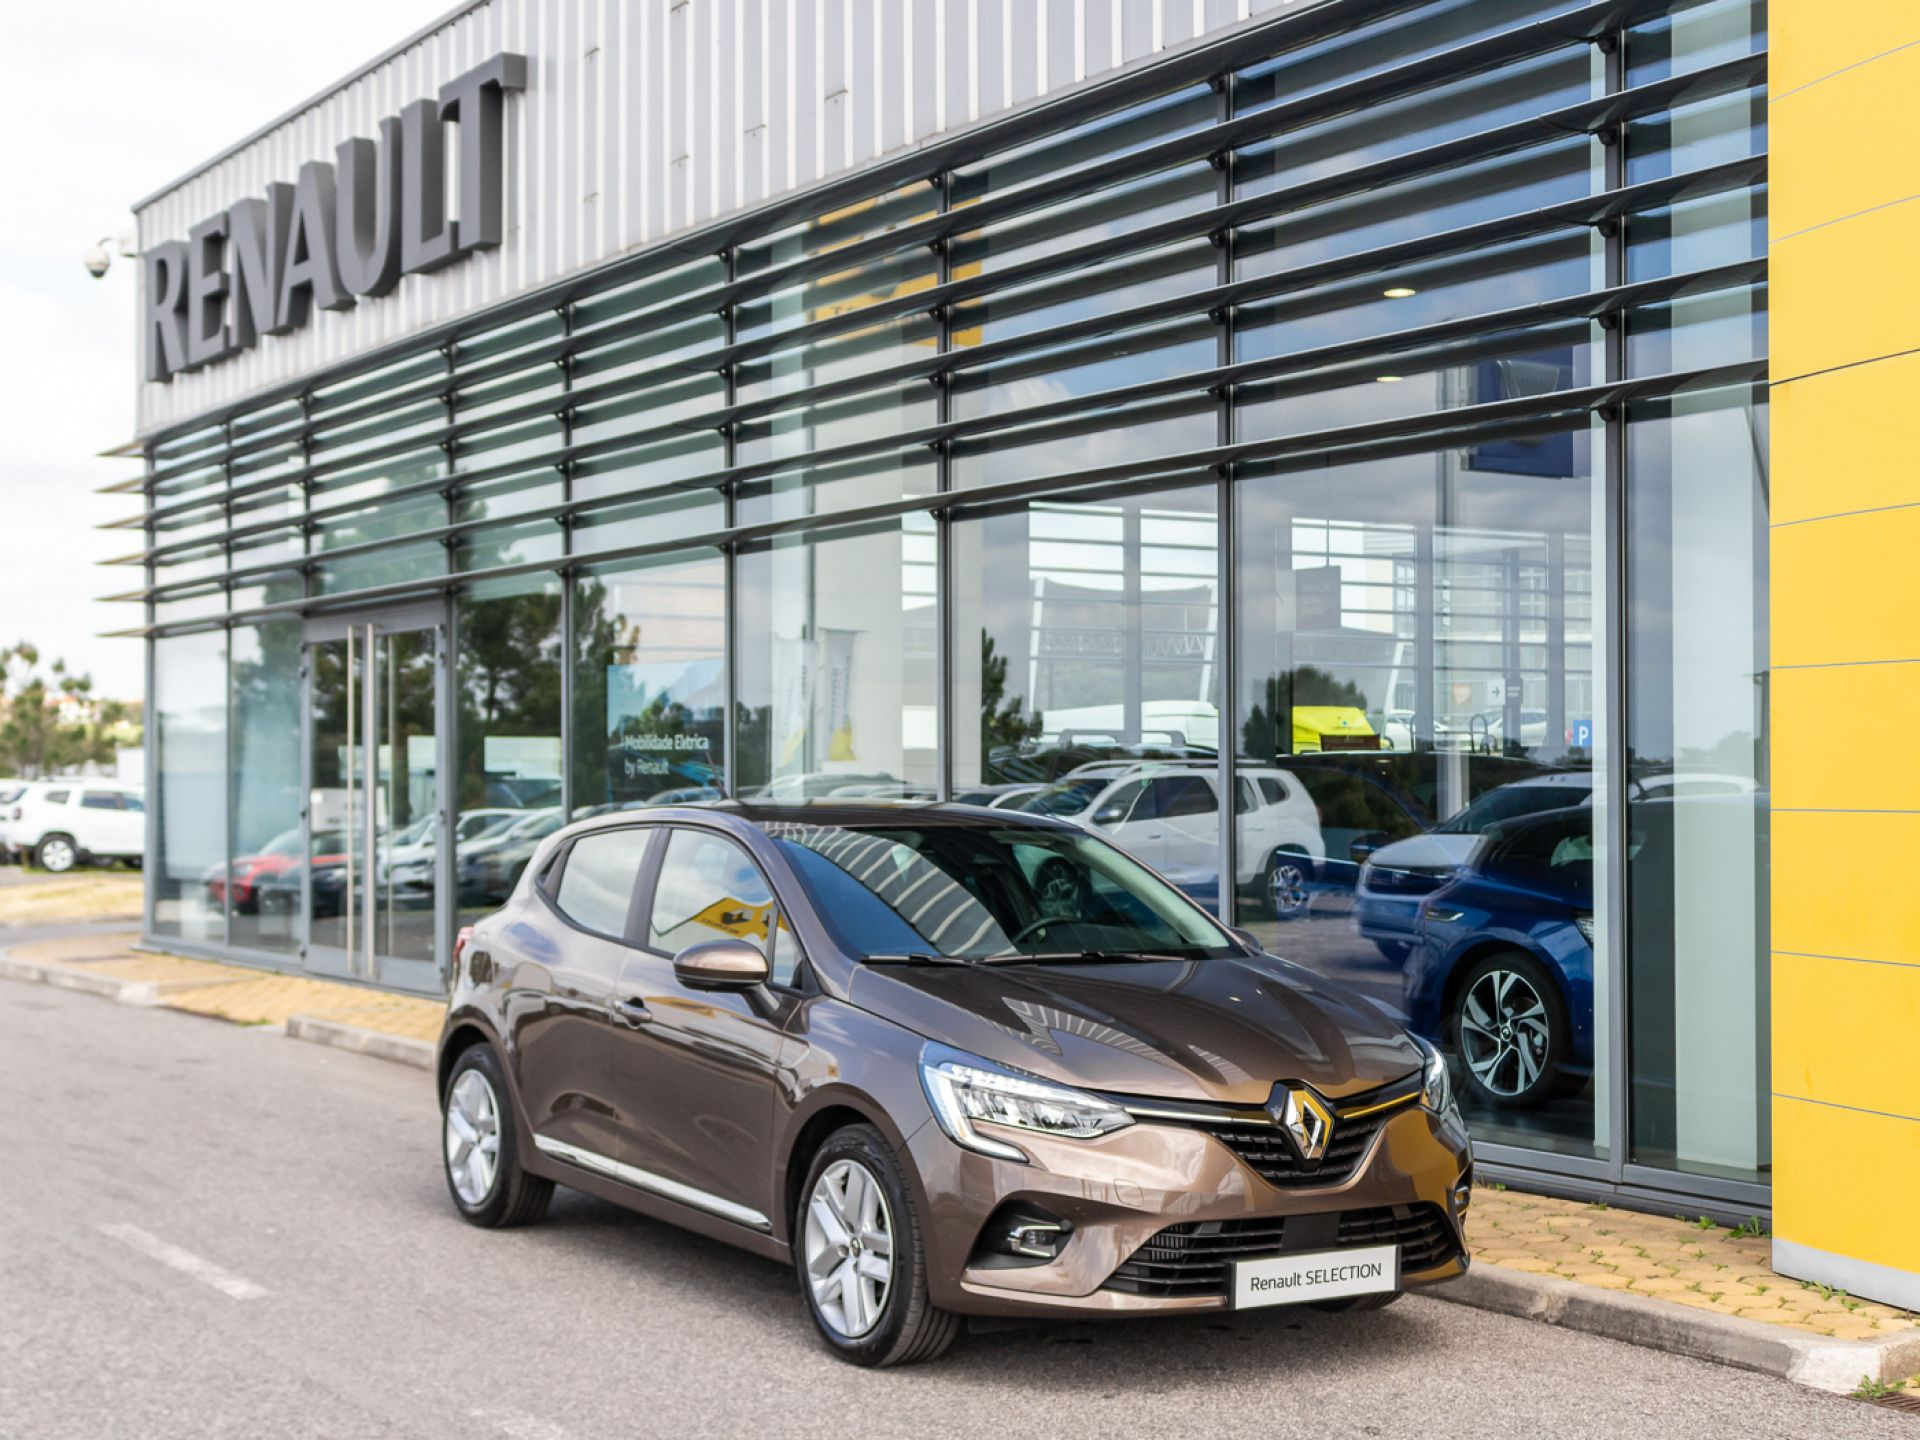 Renault Clio TCe 100 Intens usada Setúbal